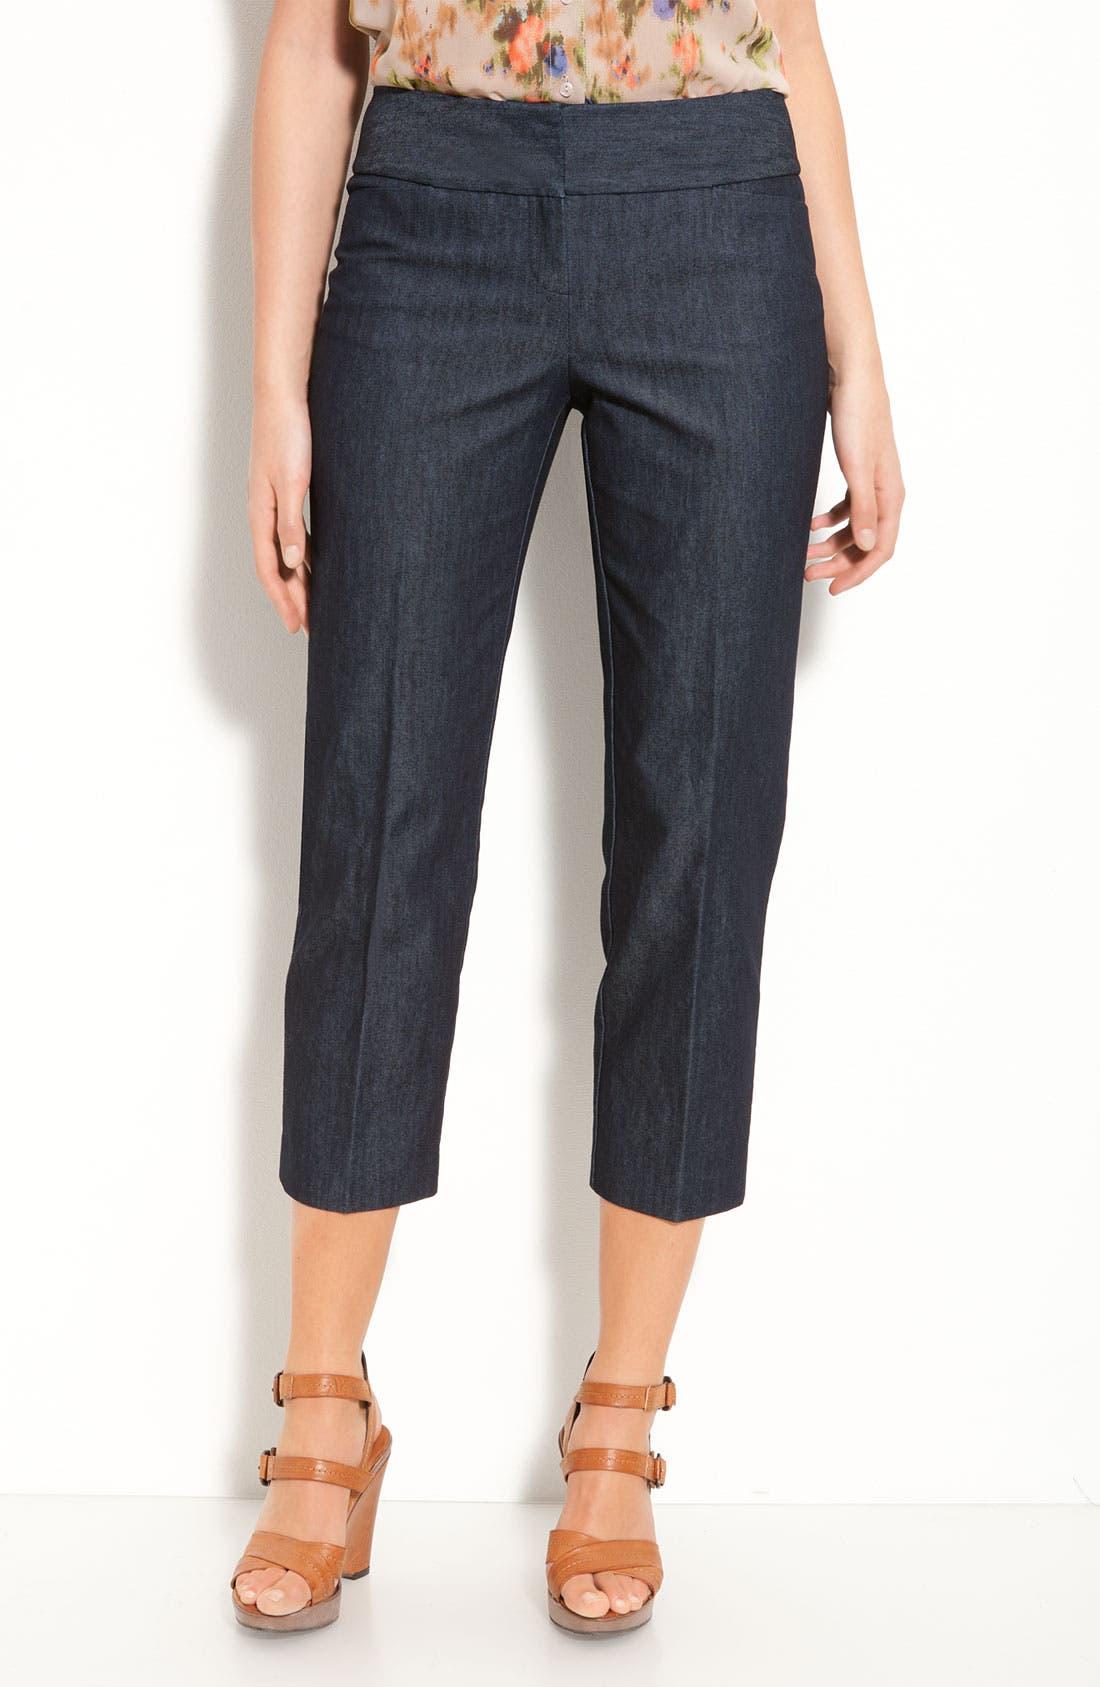 Alternate Image 1 Selected - Halogen® 'Taylor' Curvy Fit Stretch Denim Crop Pants